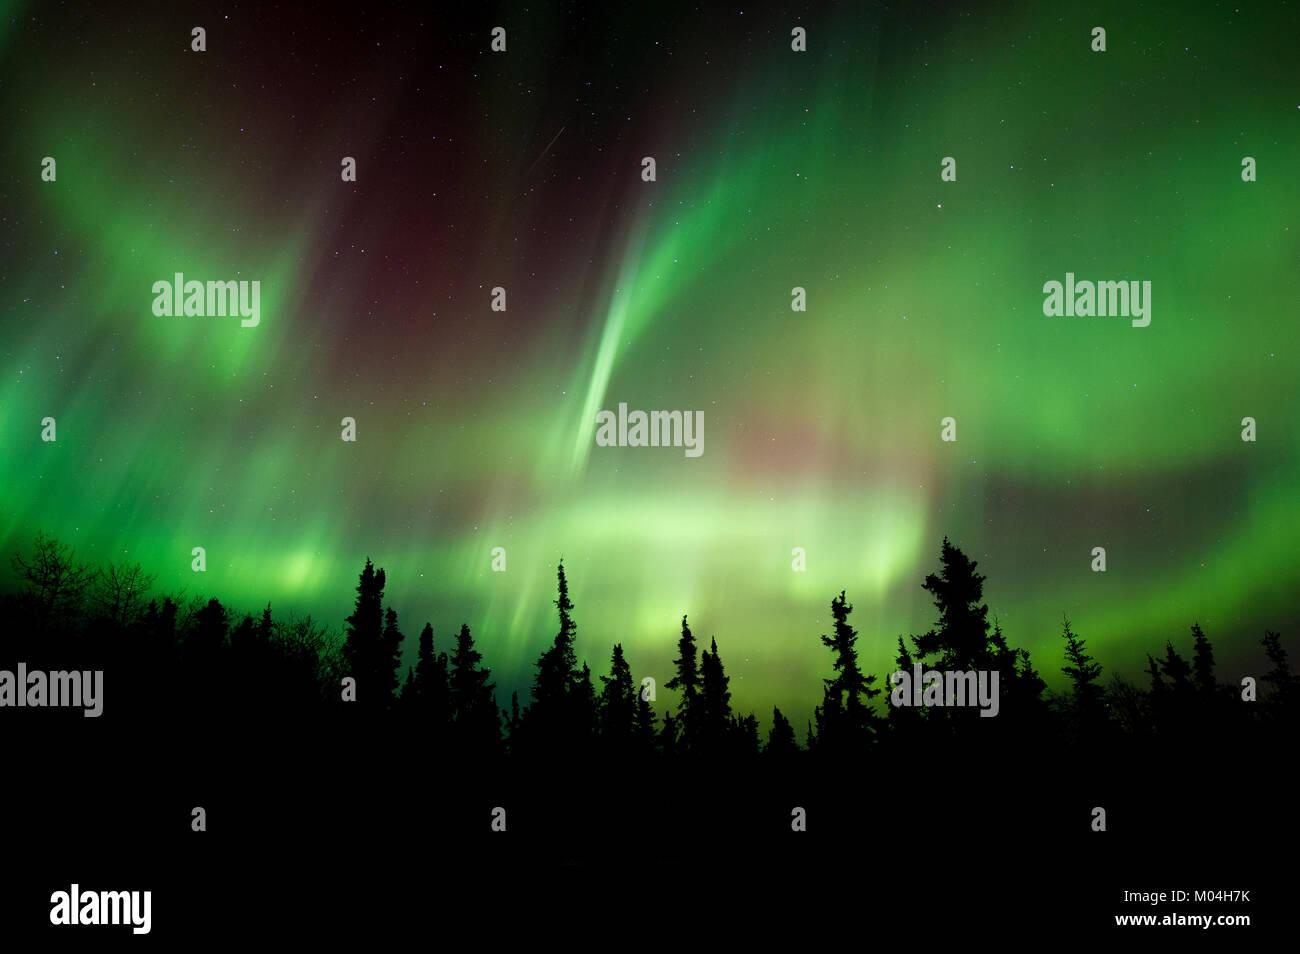 Aurora borealis, northern lights, north of Fairbanks, Alaska. March 2016, by Dominique Braud/Dembinsky Photo Assoc Stock Photo